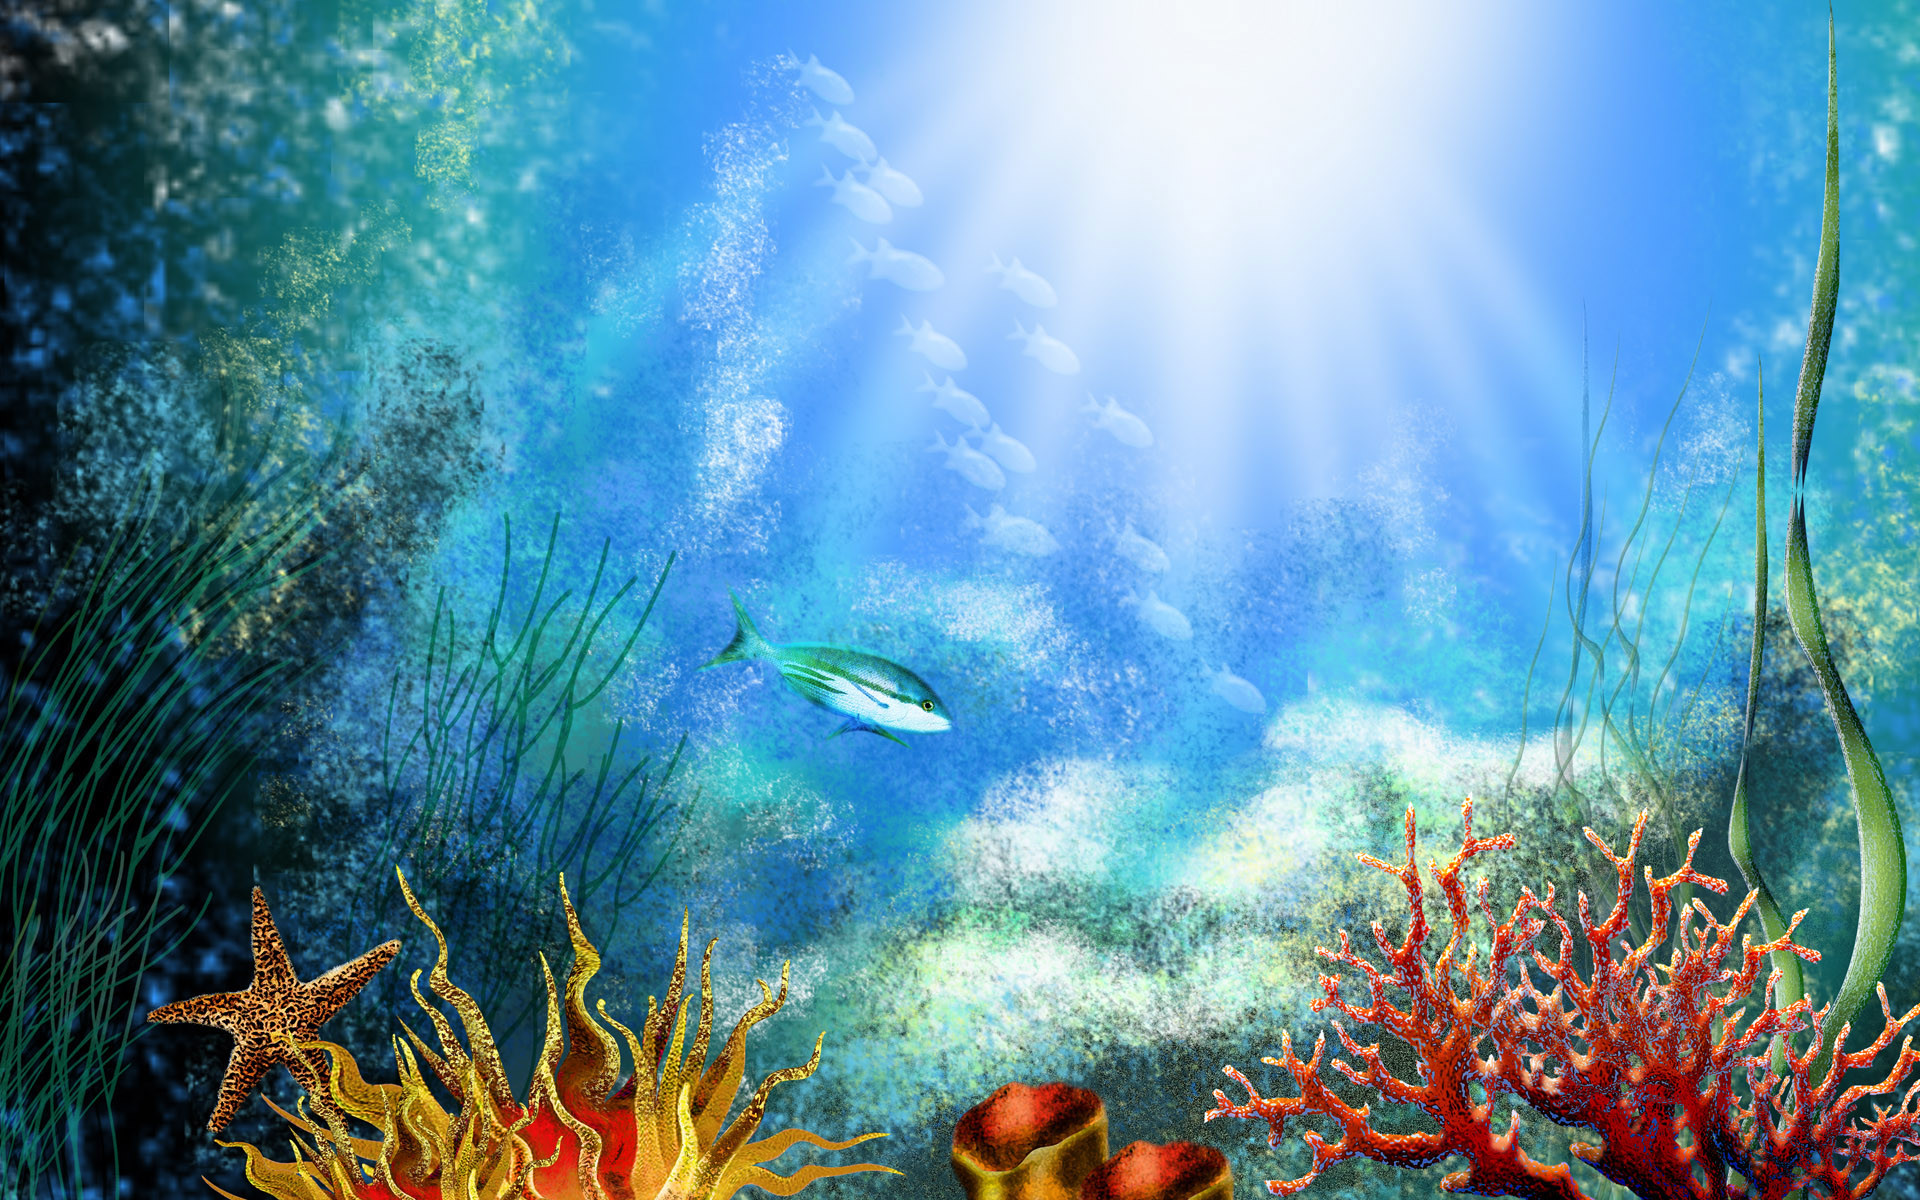 Full Size of Fish Tank Diy Fish Tankgrounds For Gallon Tankfishground  Computer Clingsfish Paper 3dfish Incredibleish …